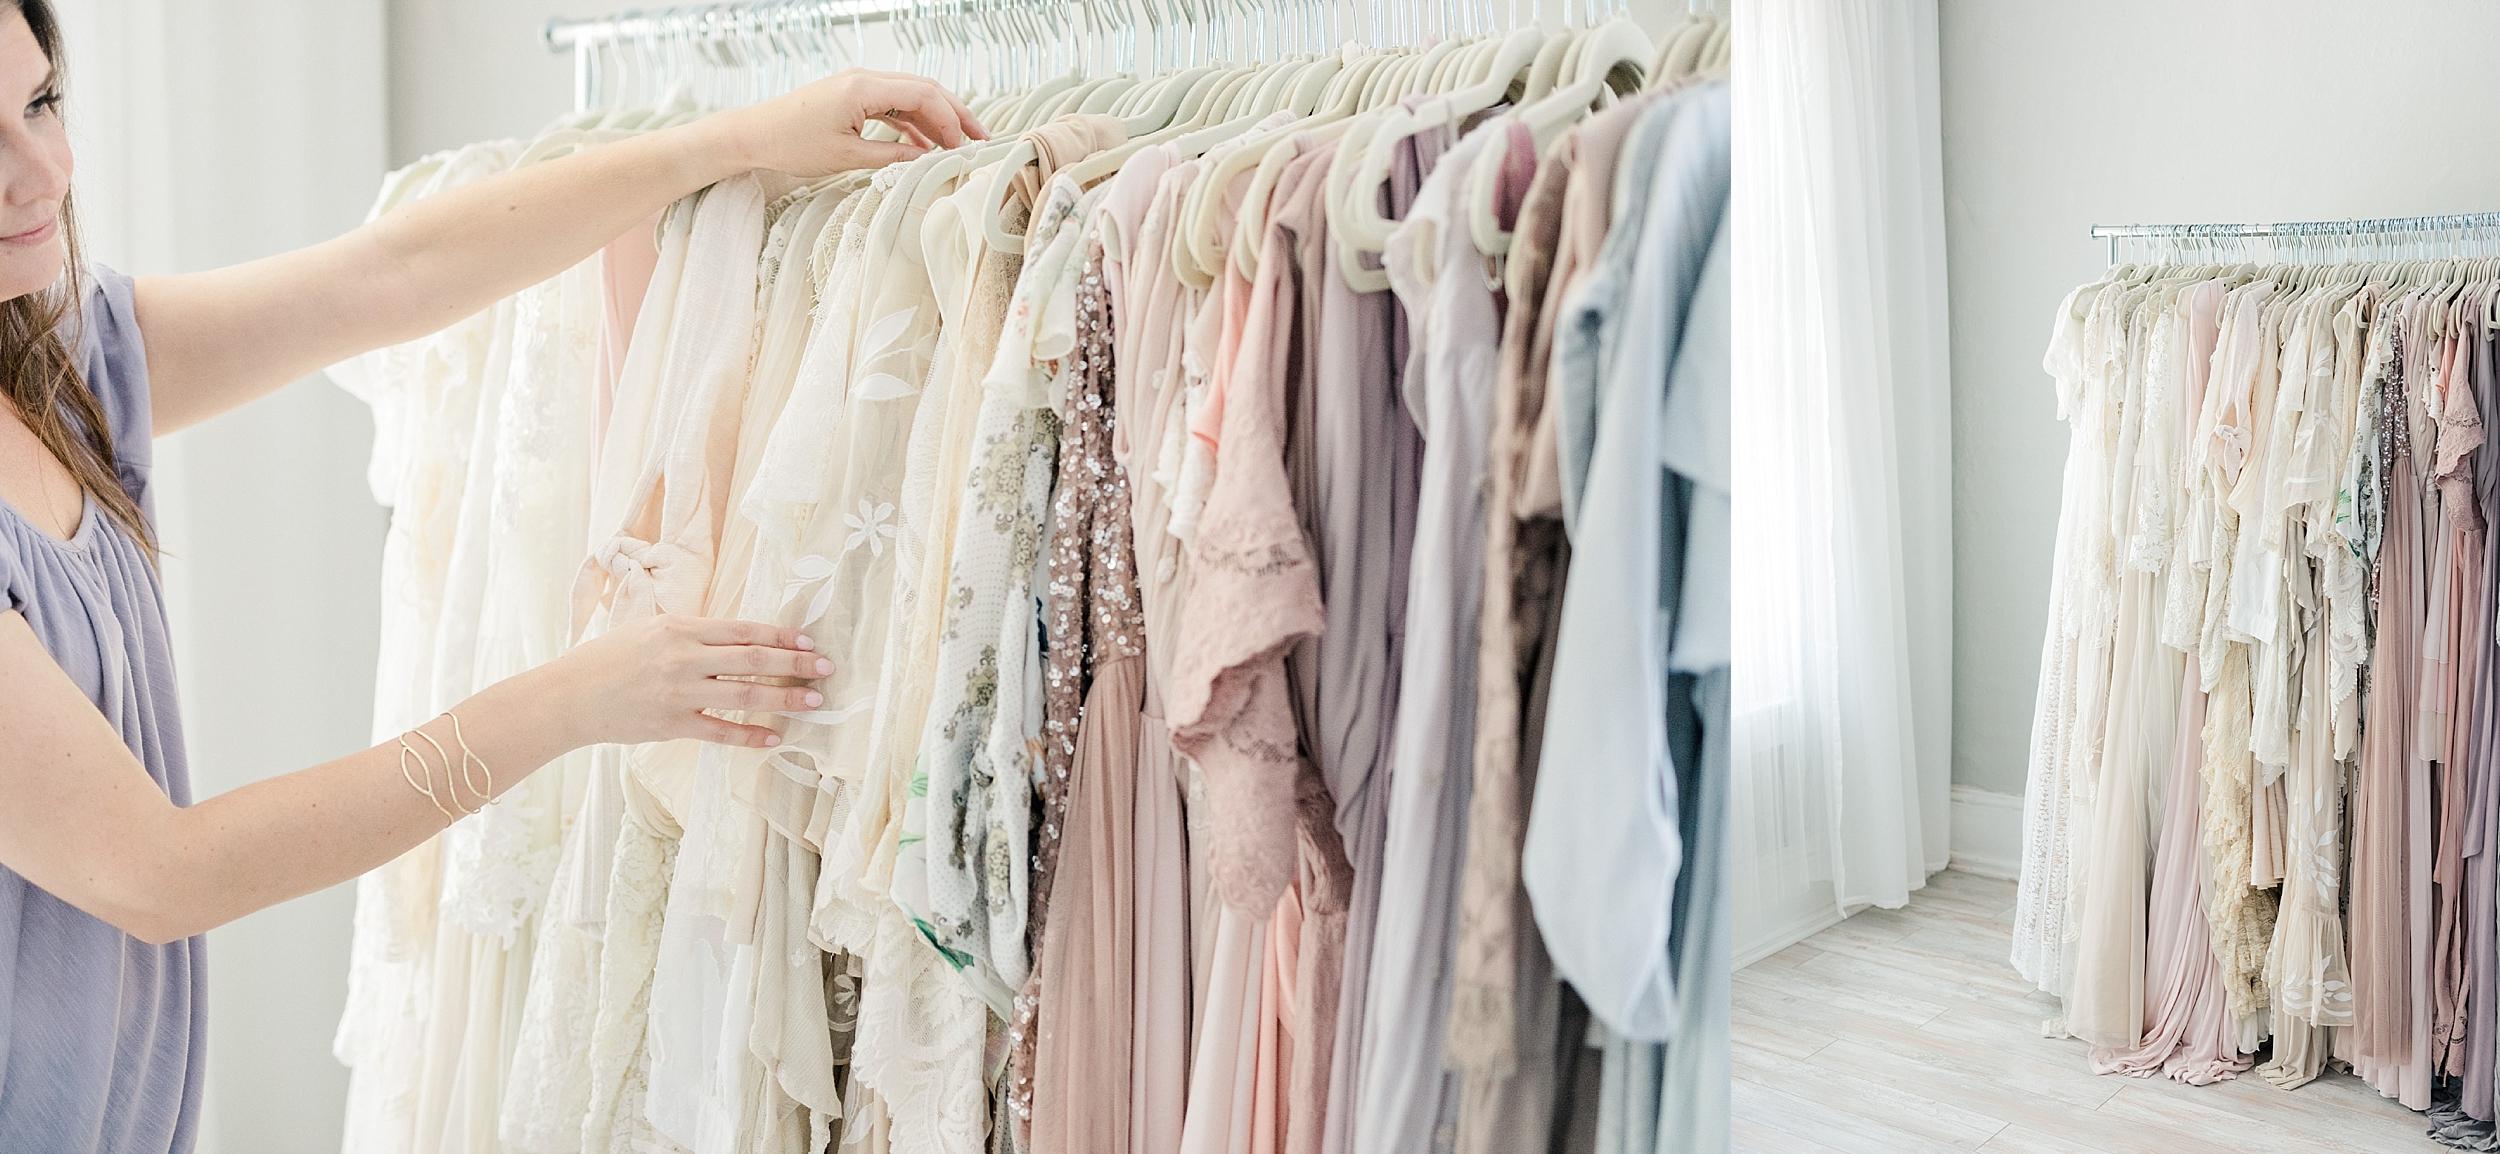 atlanta-maternity-photographer-studio-wardrobe